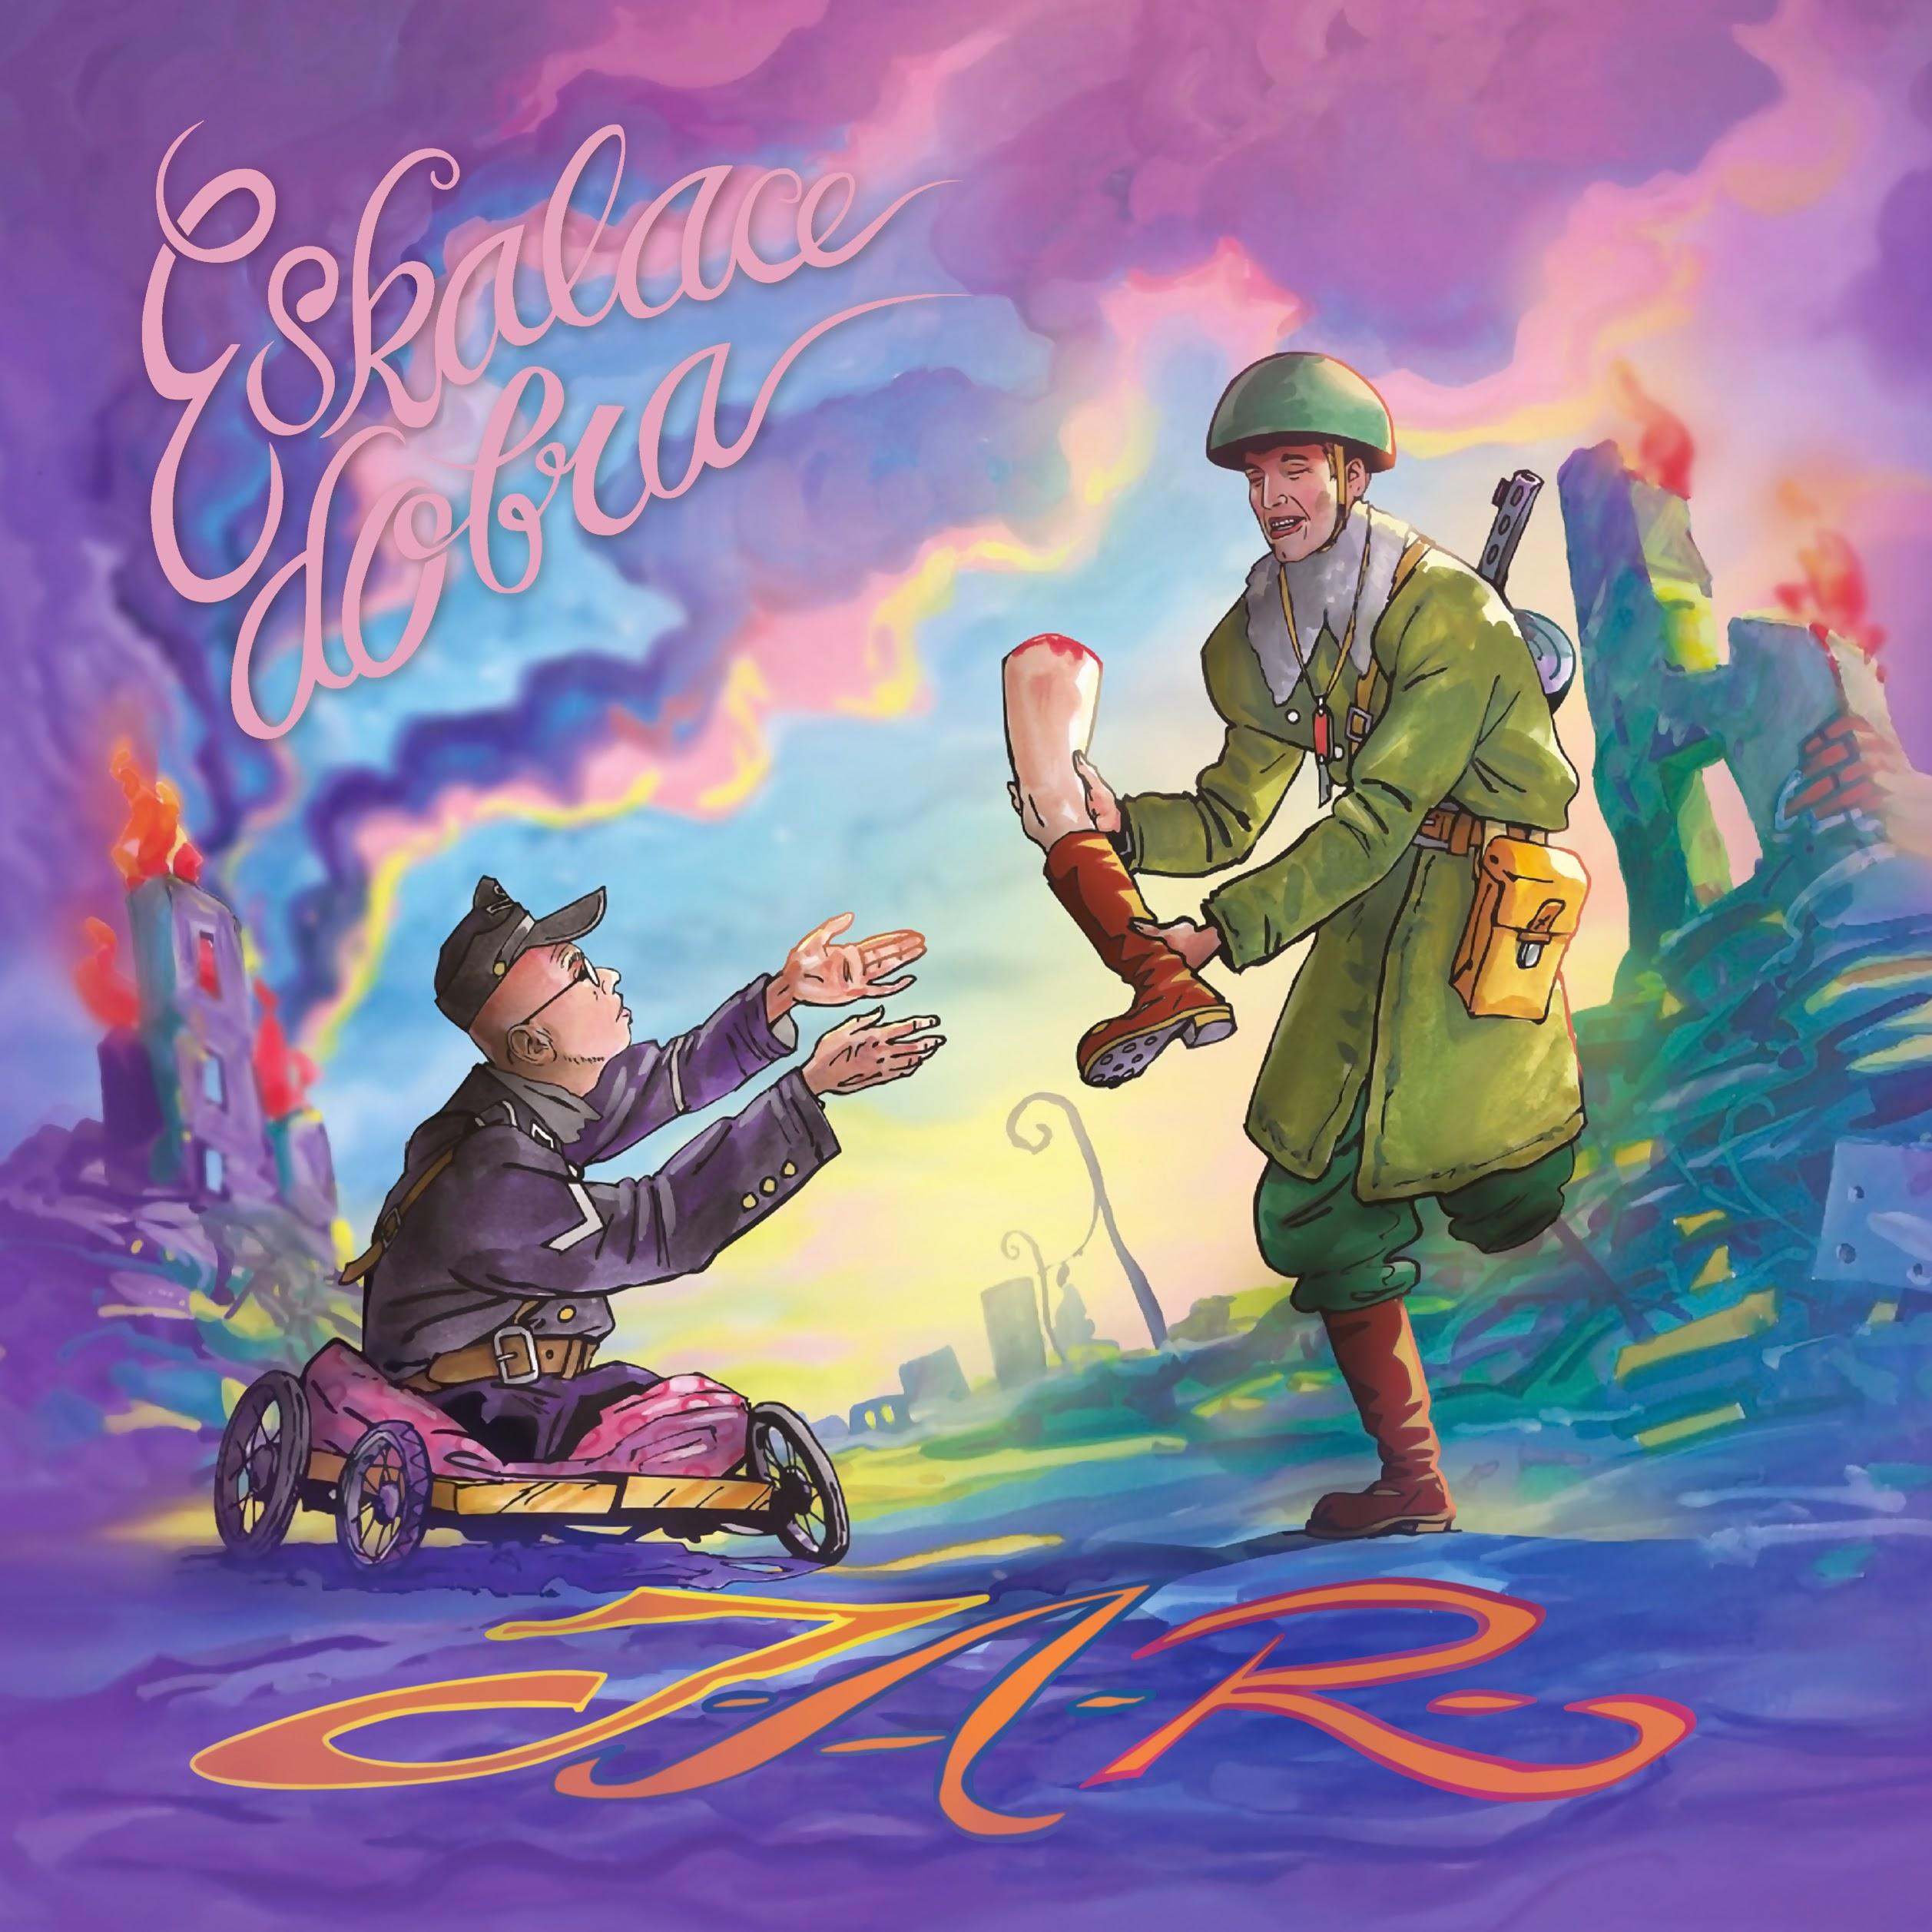 Album Artist: J.A.R. / Album Title: Eskalace dobra